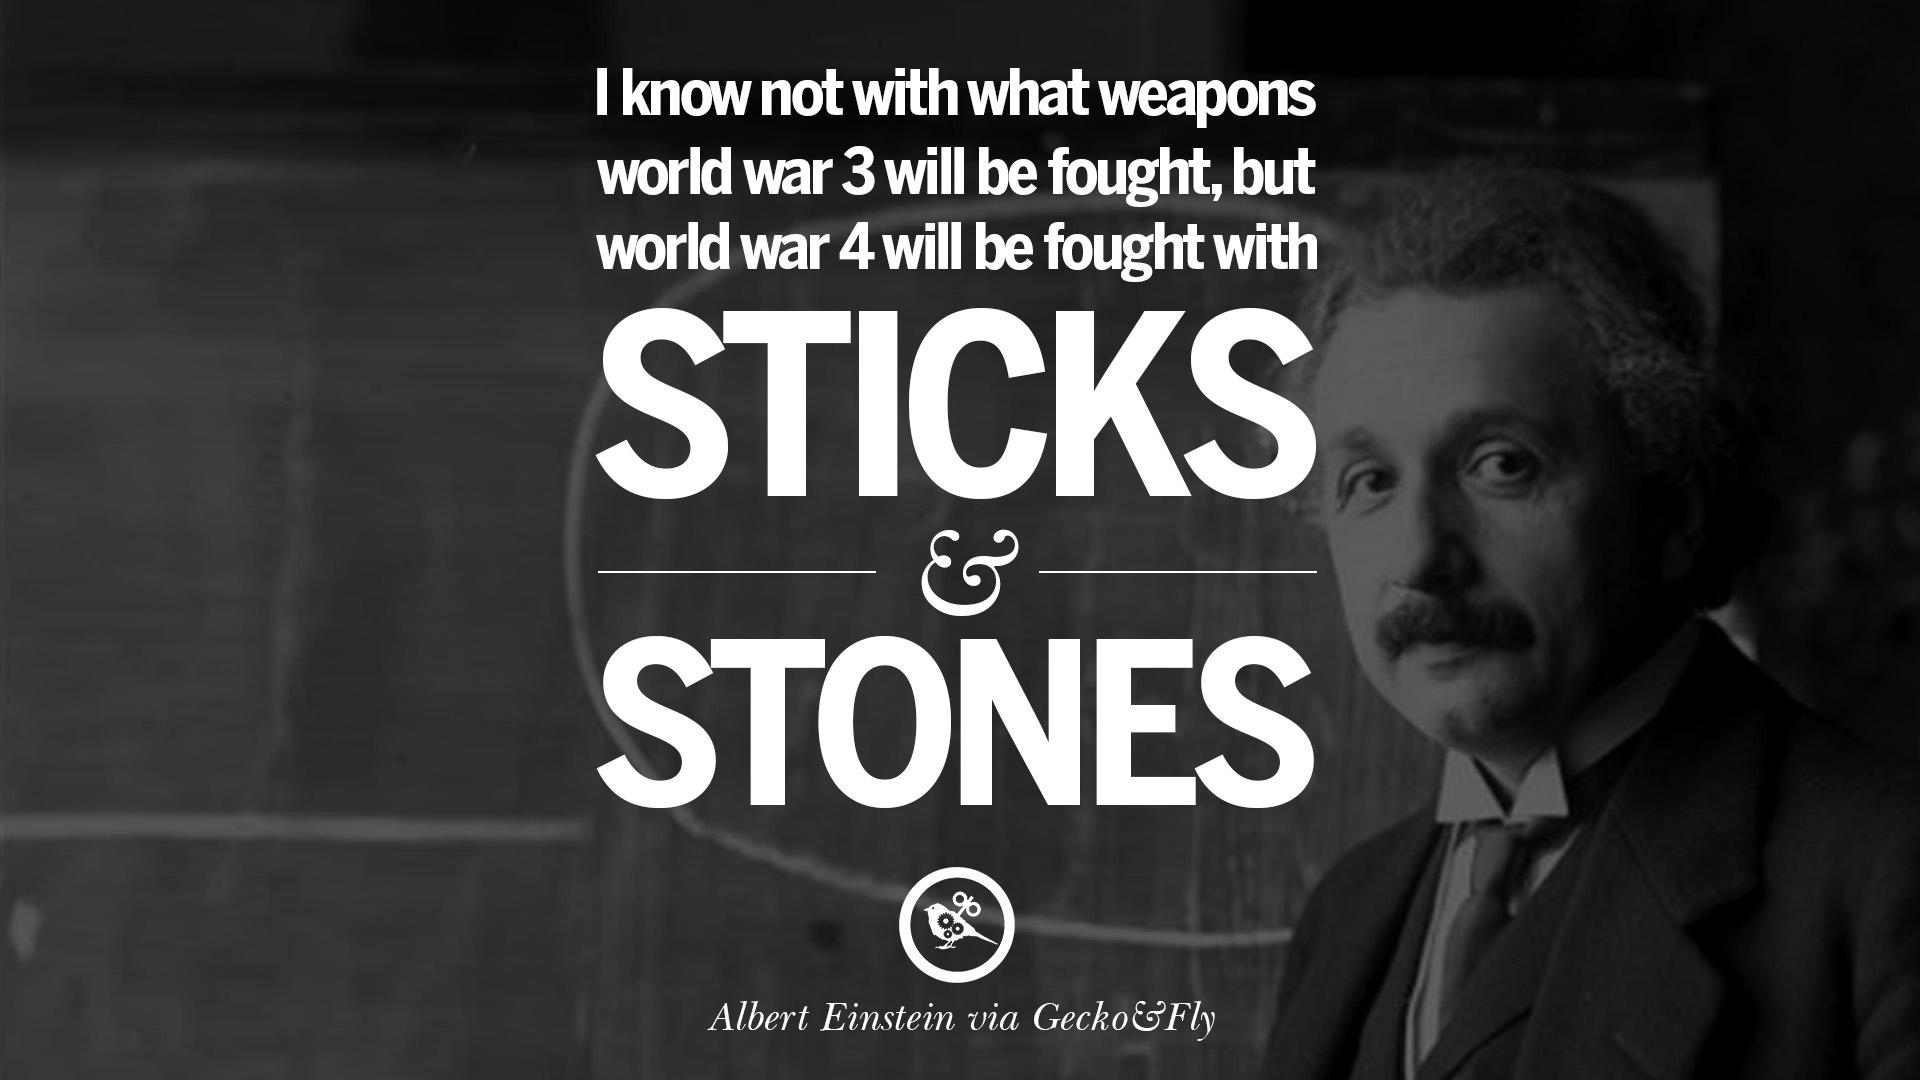 40 Beautiful Albert Einstein Quotes on God, Life, Knowledge